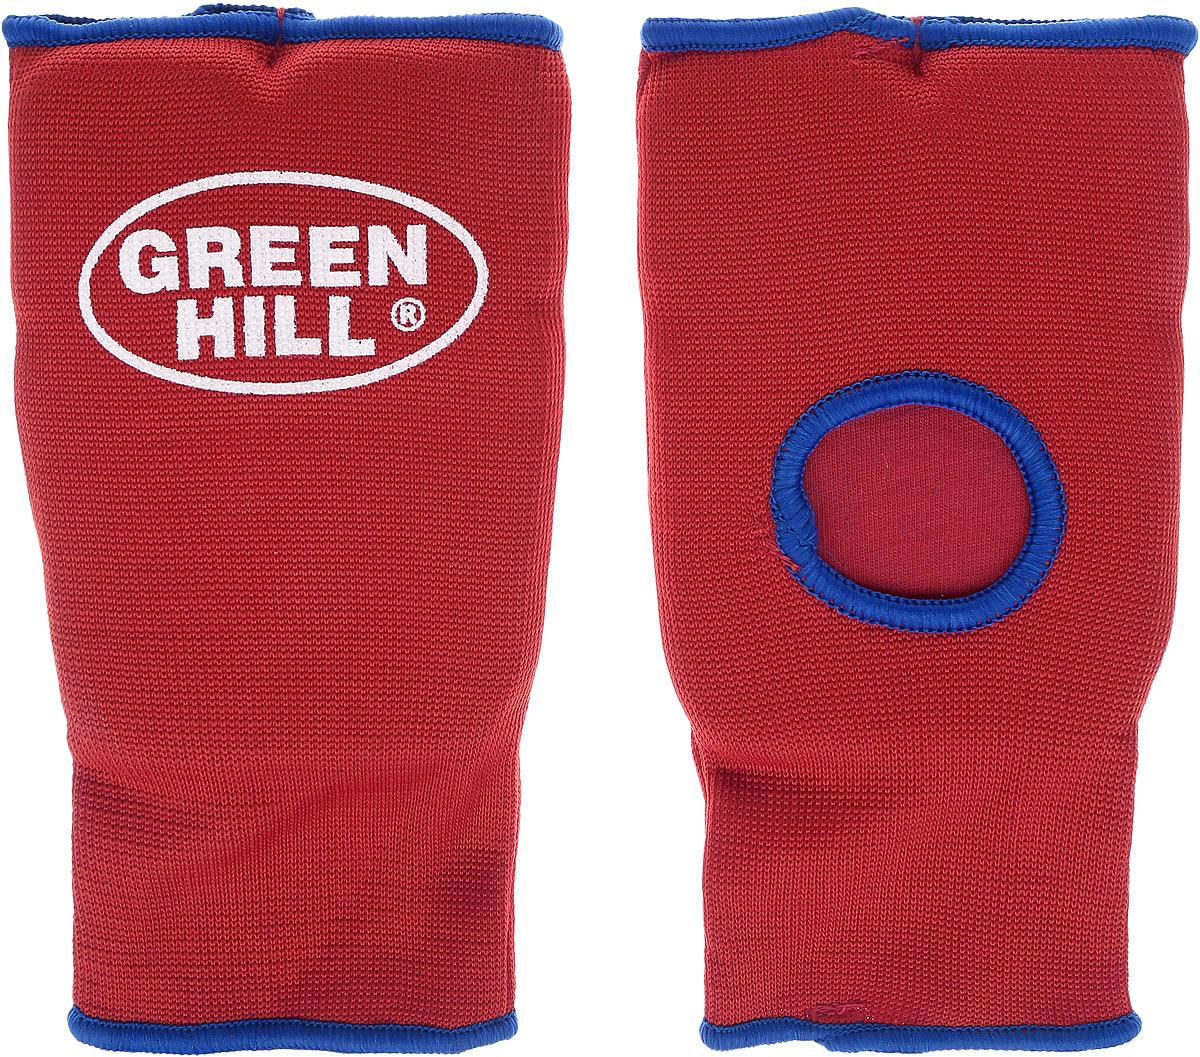 Защита на кисть Green Hill, цвет: красный, синий. Размер L. HP-0053